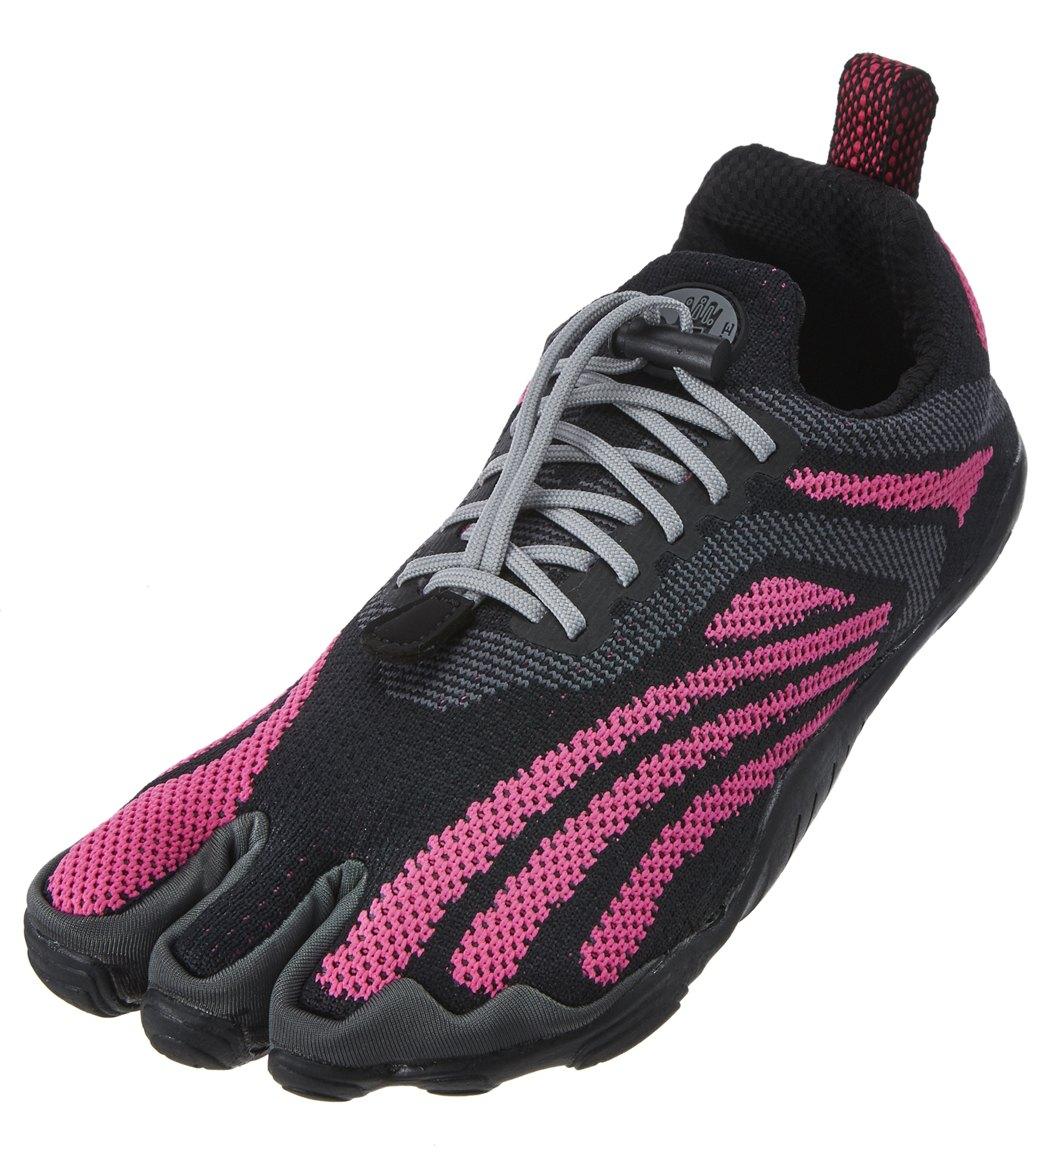 436e0503745a Body Glove Women s 3T Barefoot Requiem Water Shoe at SwimOutlet.com - Free  Shipping